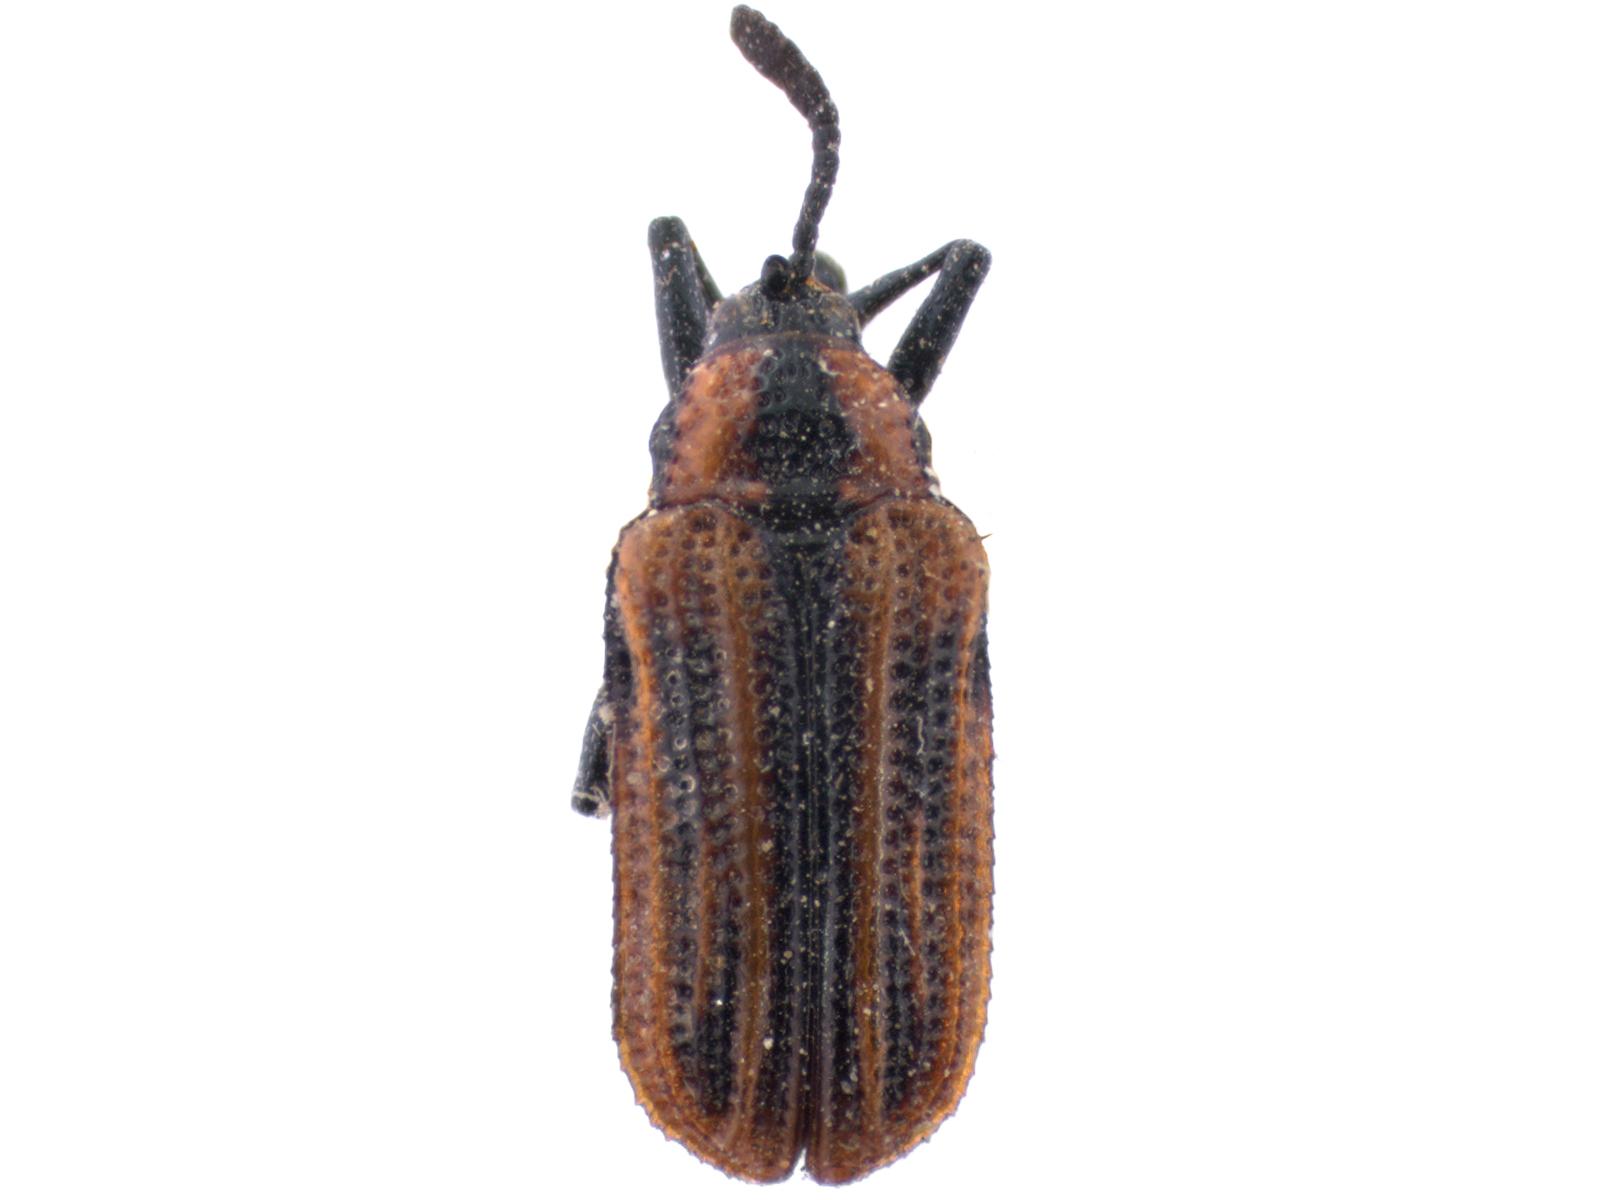 Pentispa vittatipennis(Baly, 1885)